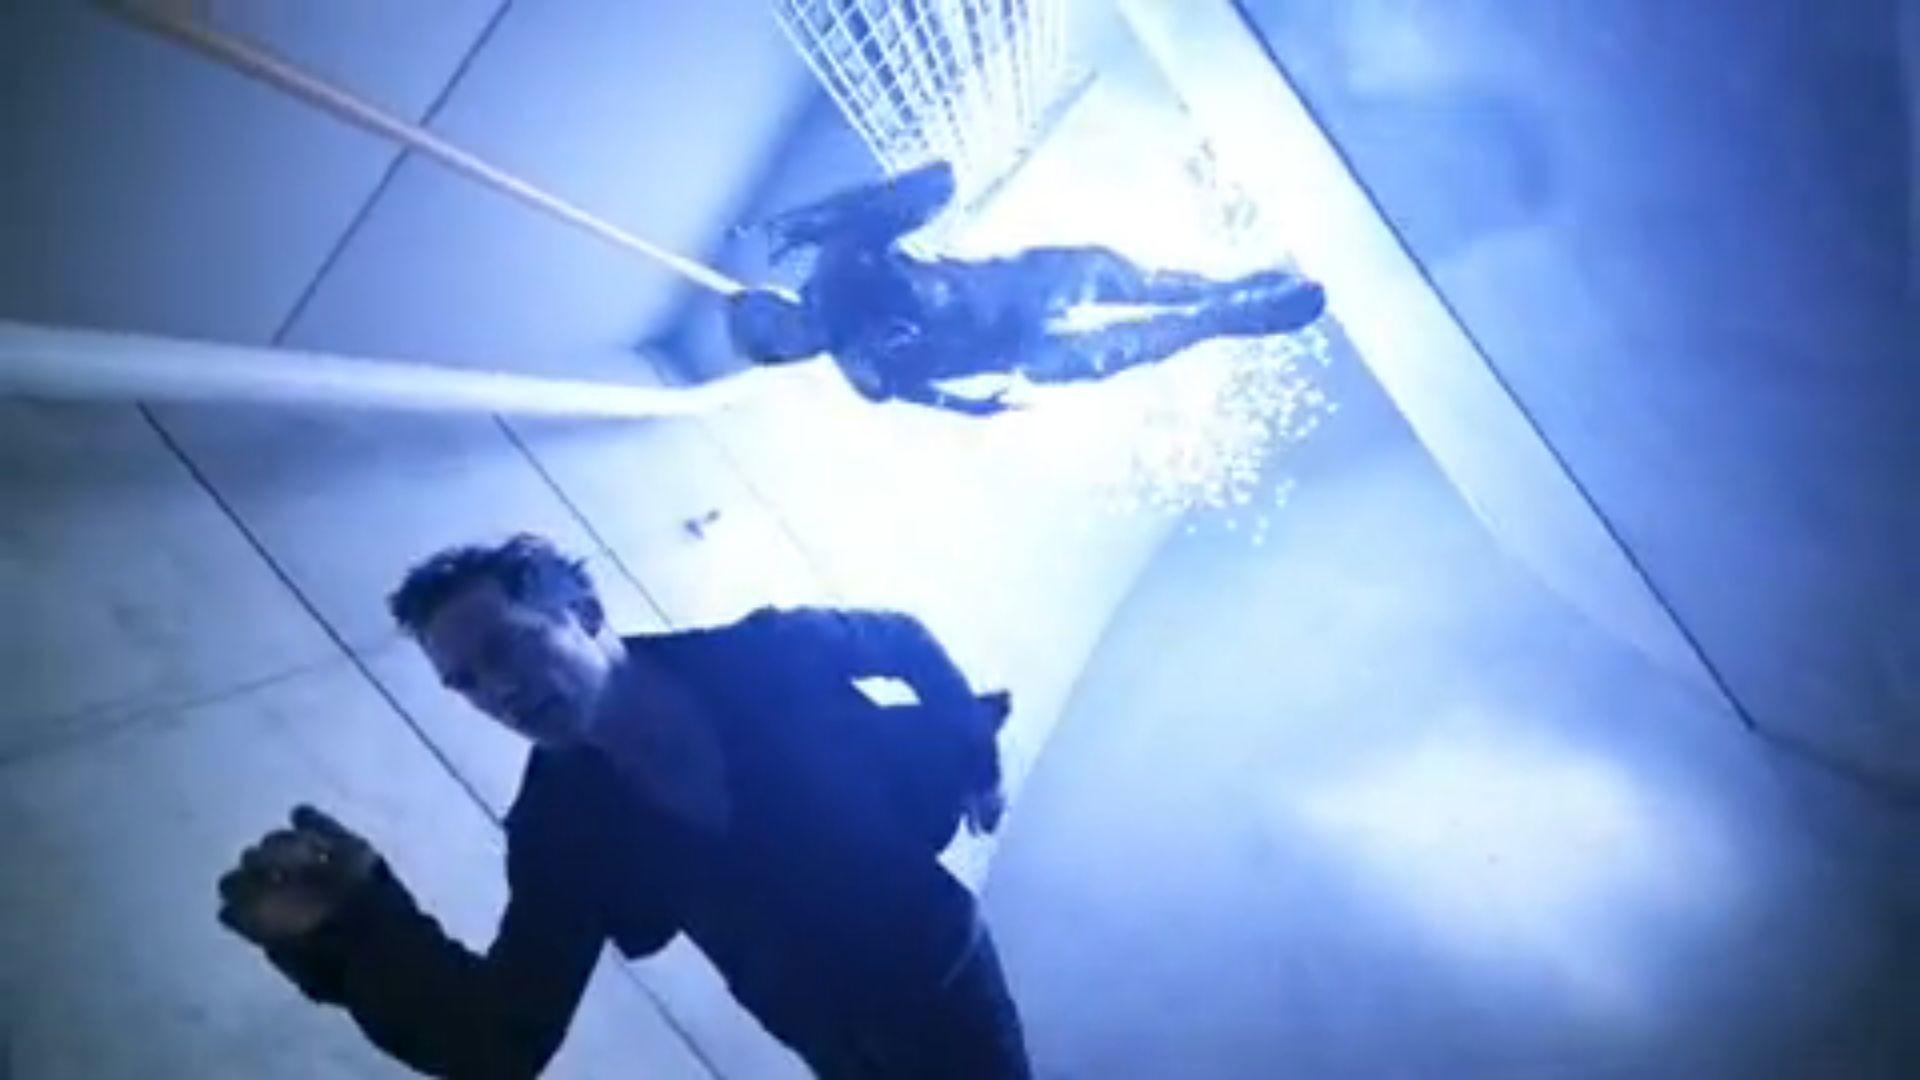 <b>The Flash</b>' Trailer Hits: 9 Cool Blink